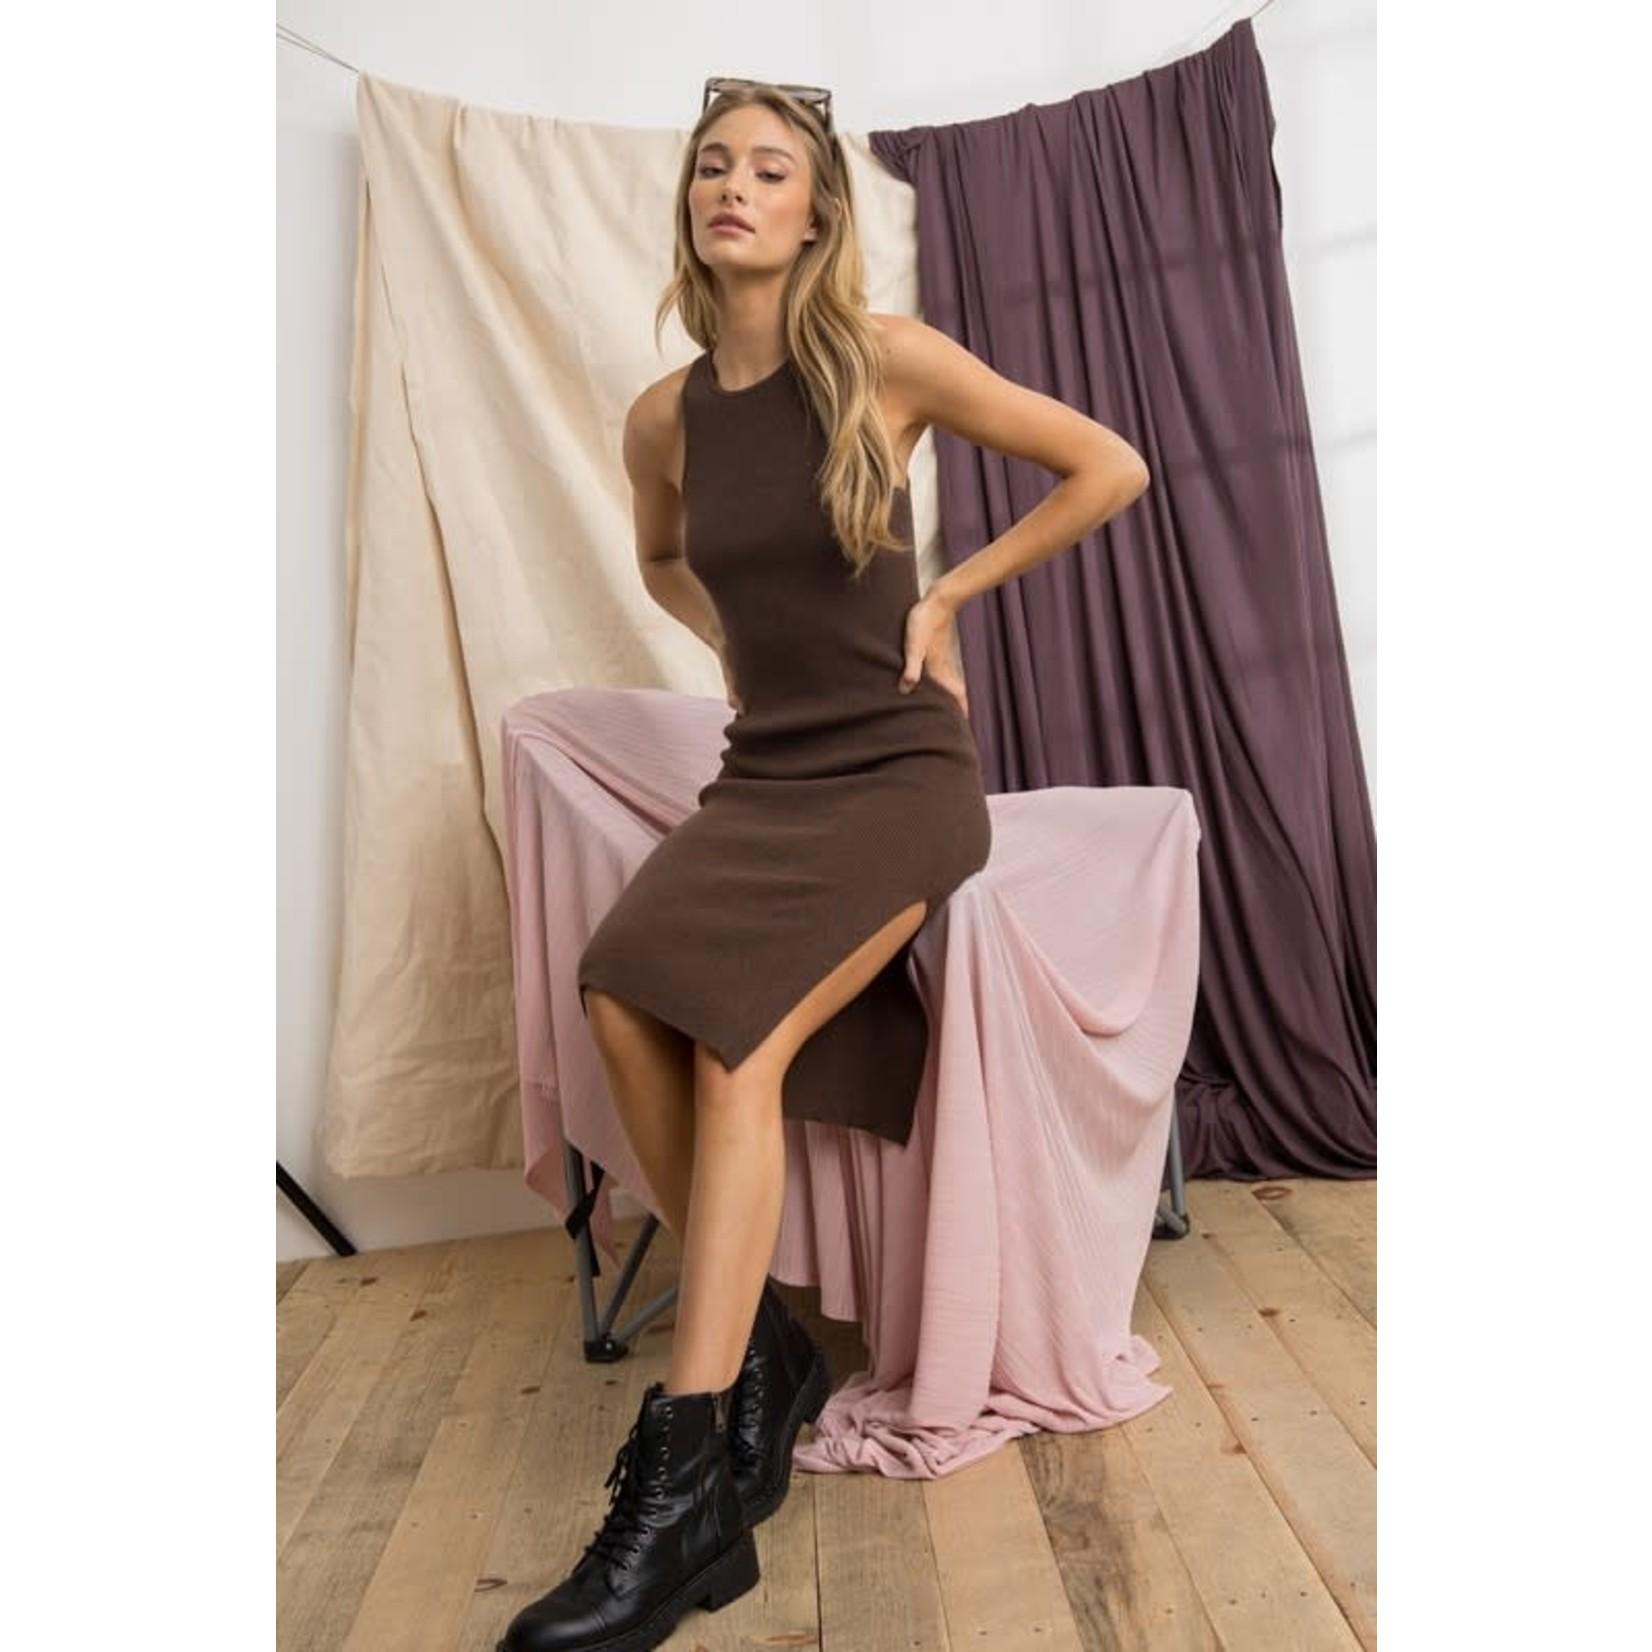 EM & ELLE Jillianna Fitted Dress